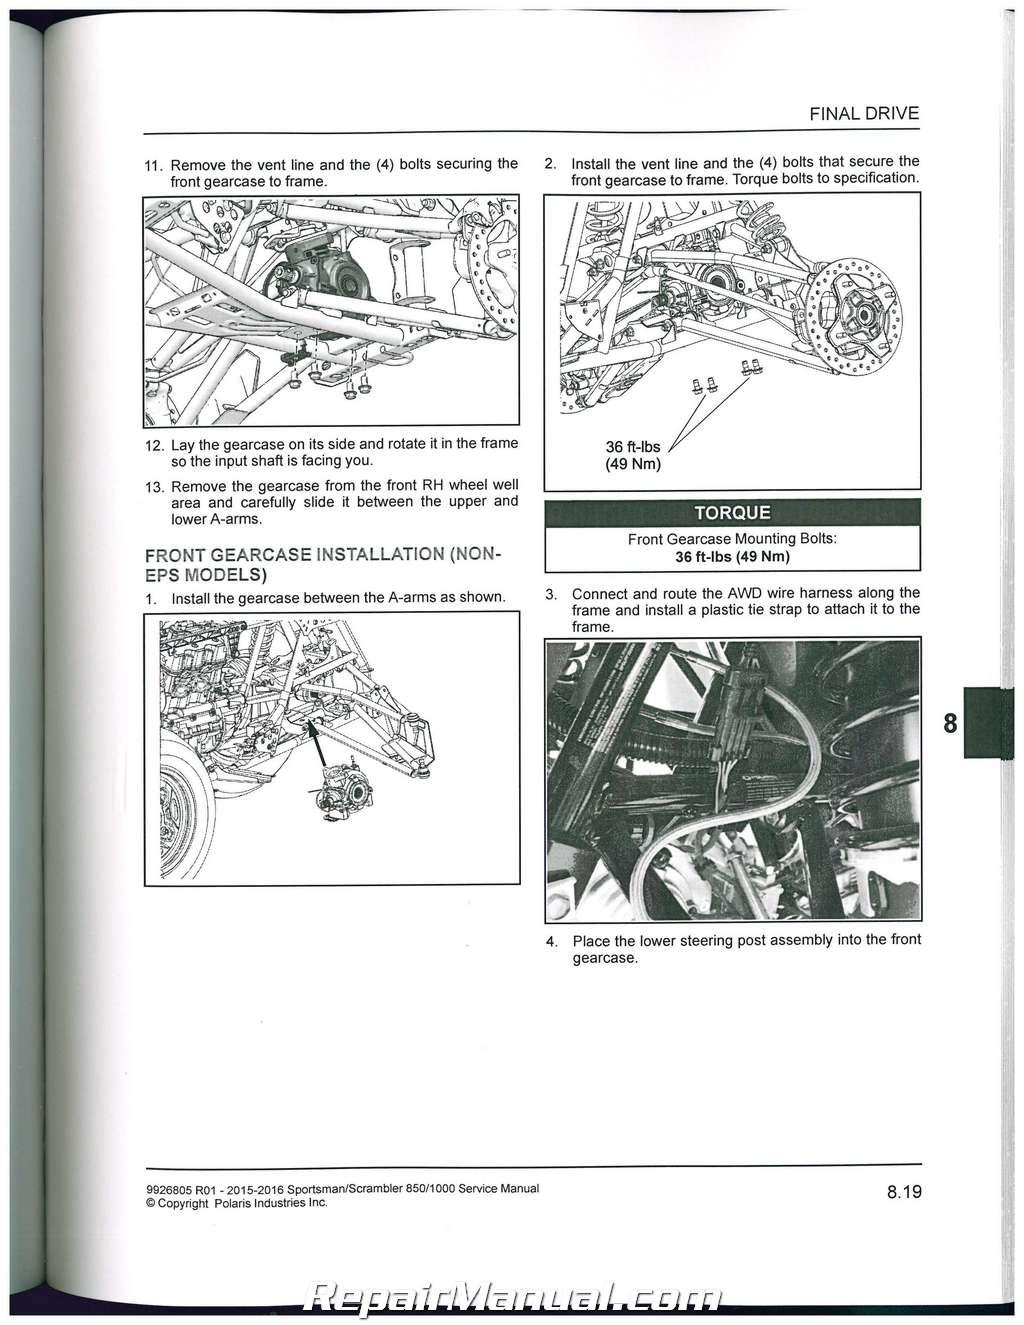 Rzr 1000 Dimensions >> 2015-2016 Polaris Scrambler Sportsman 850 1000 ATV Service